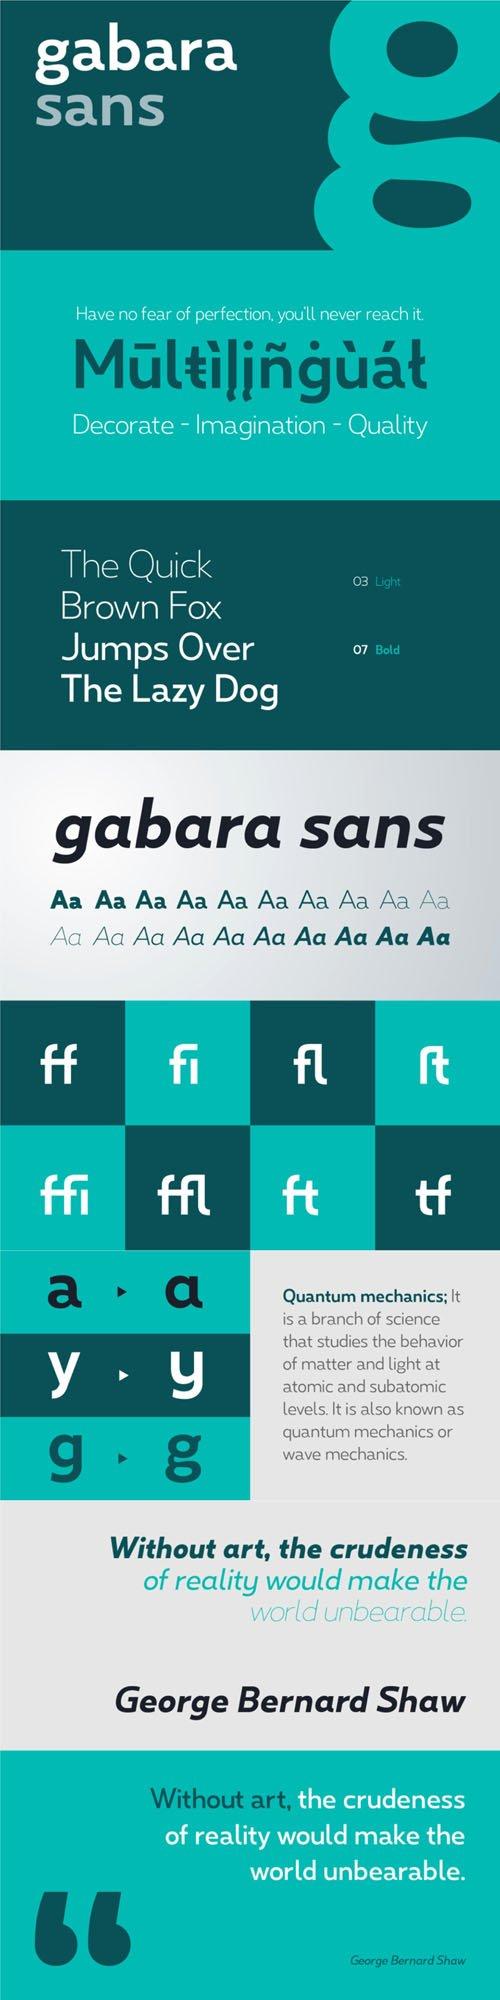 Gabara Sans - Dynamic Sans Serif Font Family [4-Weights]